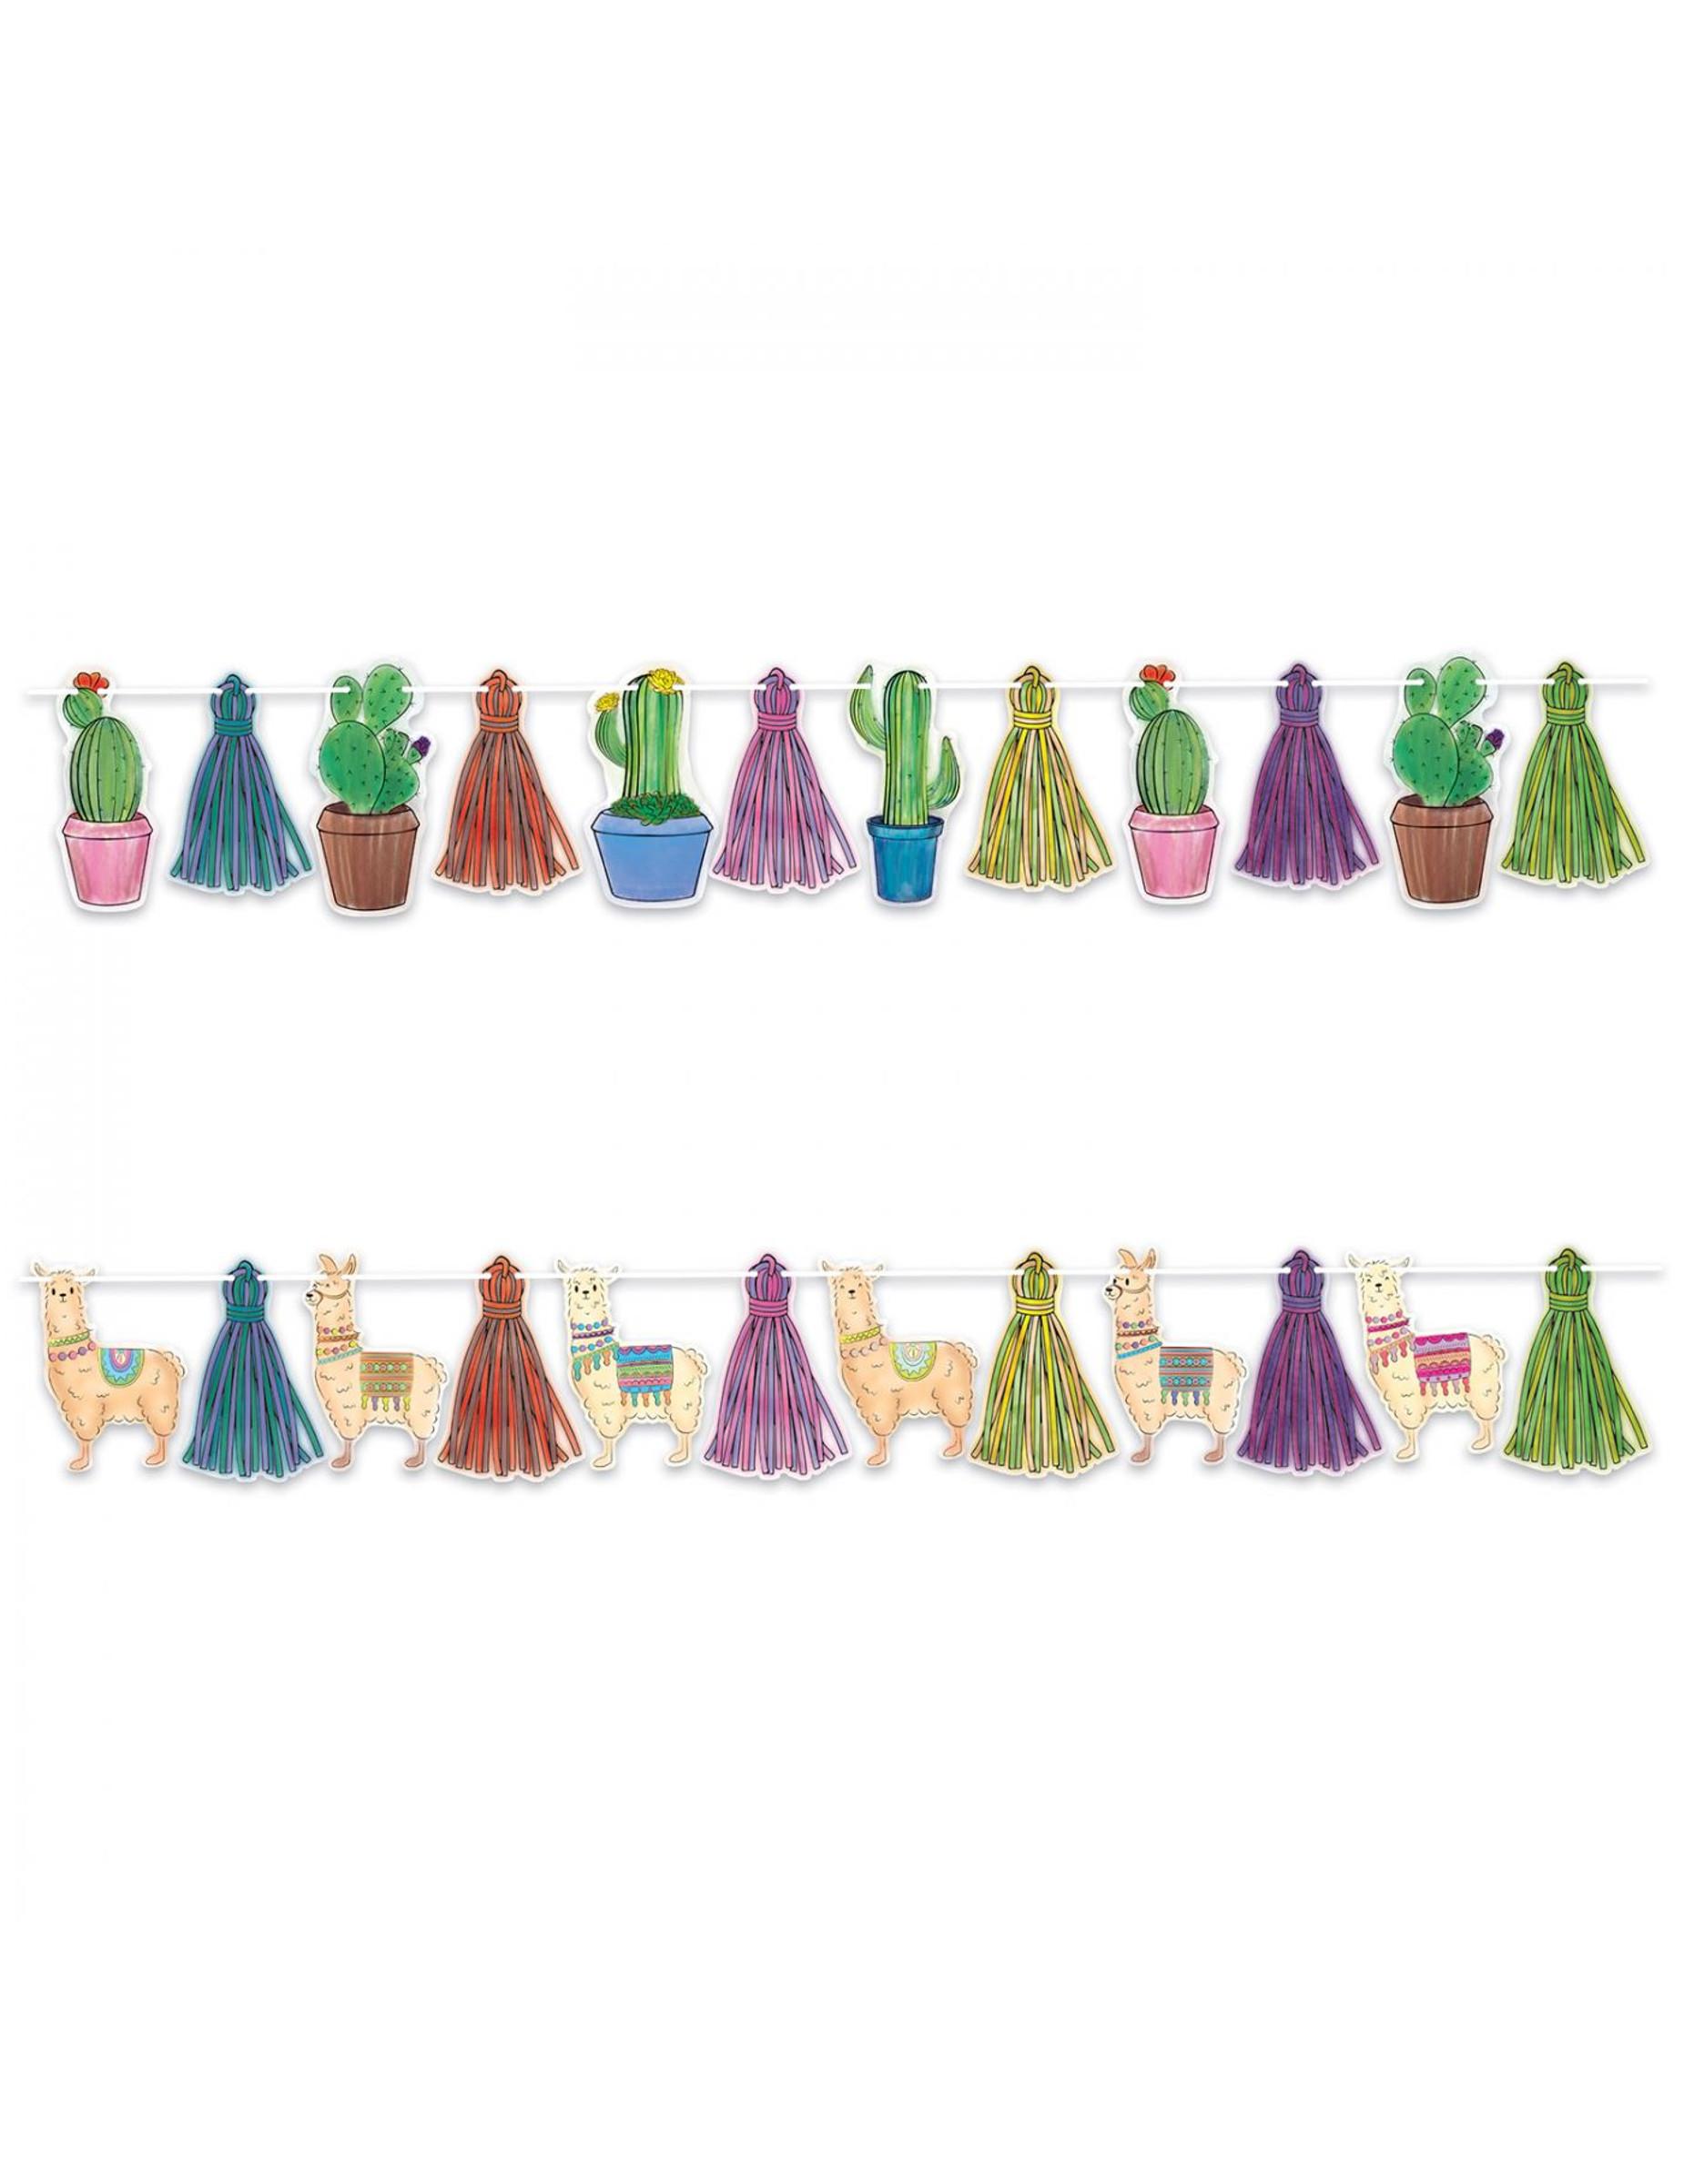 #Lama und Kaktus Girlande aus Pappkarton 365 cm#